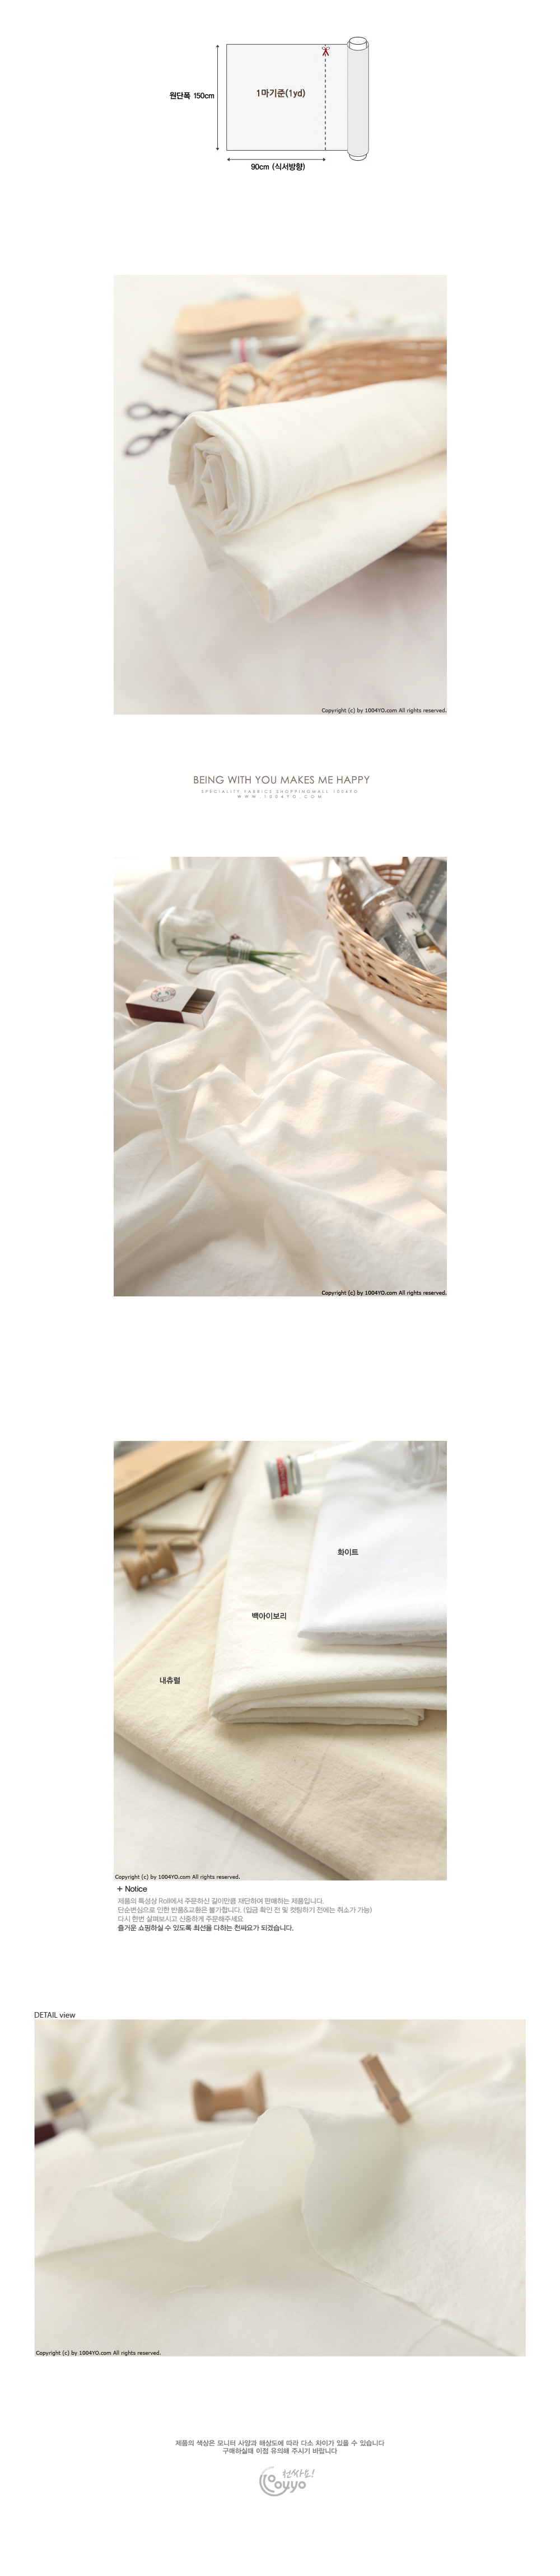 washing_ivory.jpg